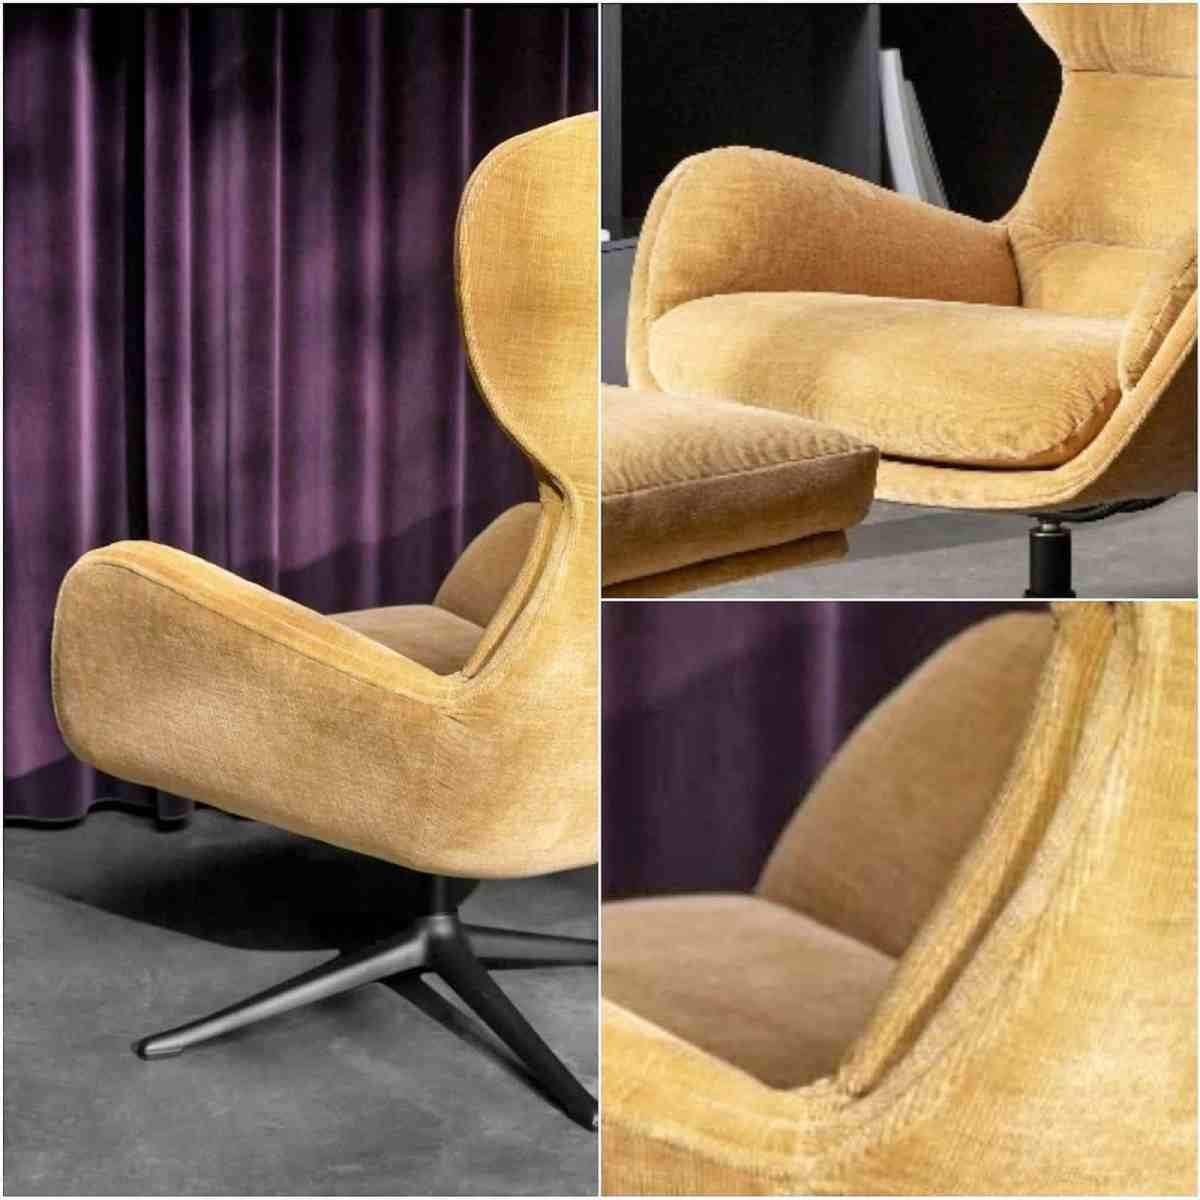 bocncept experience sessel reno 1 - RENO - Sessel Design mit Komfort